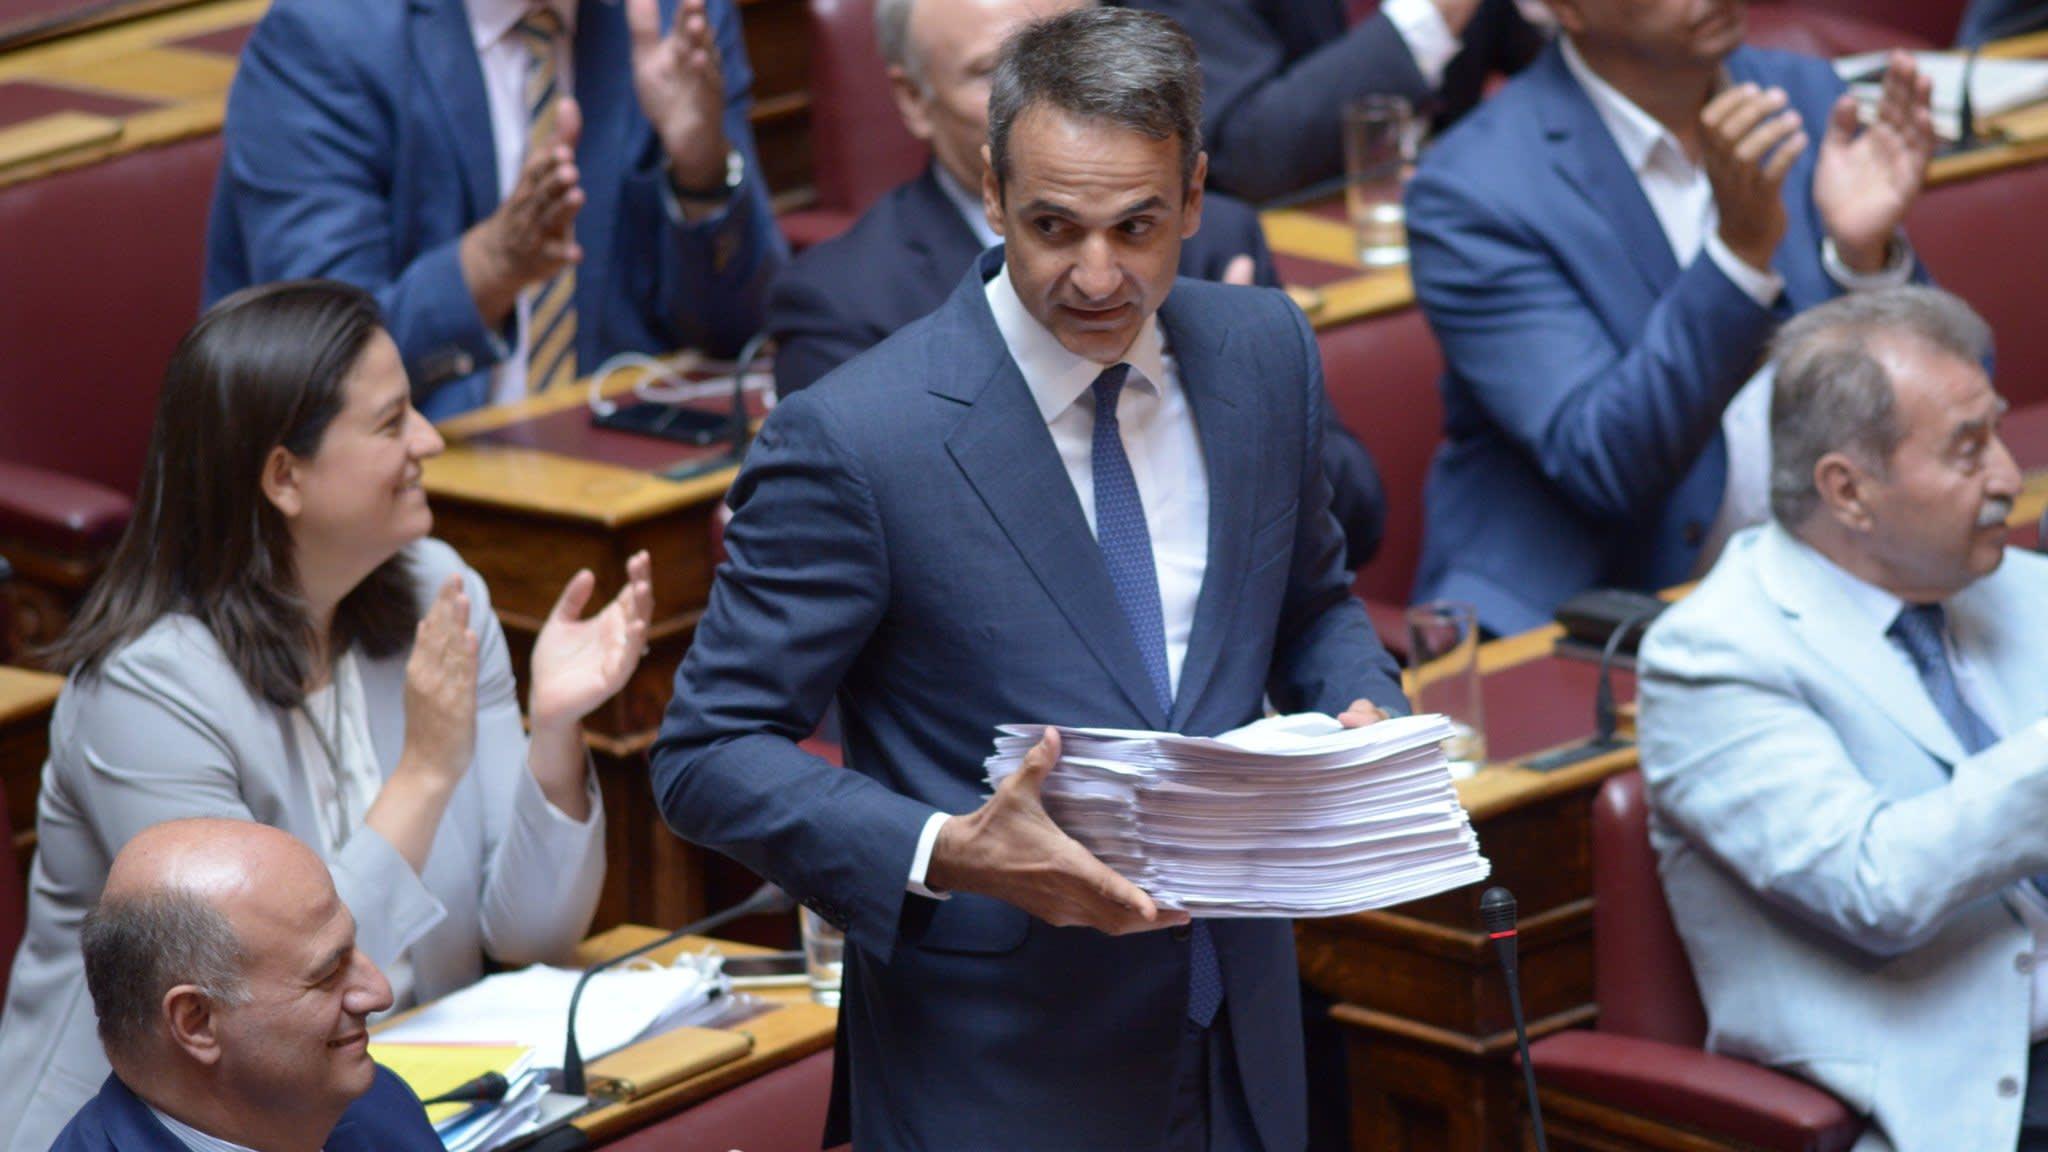 Poll favourite to be next Greek PM backs pro-market reforms